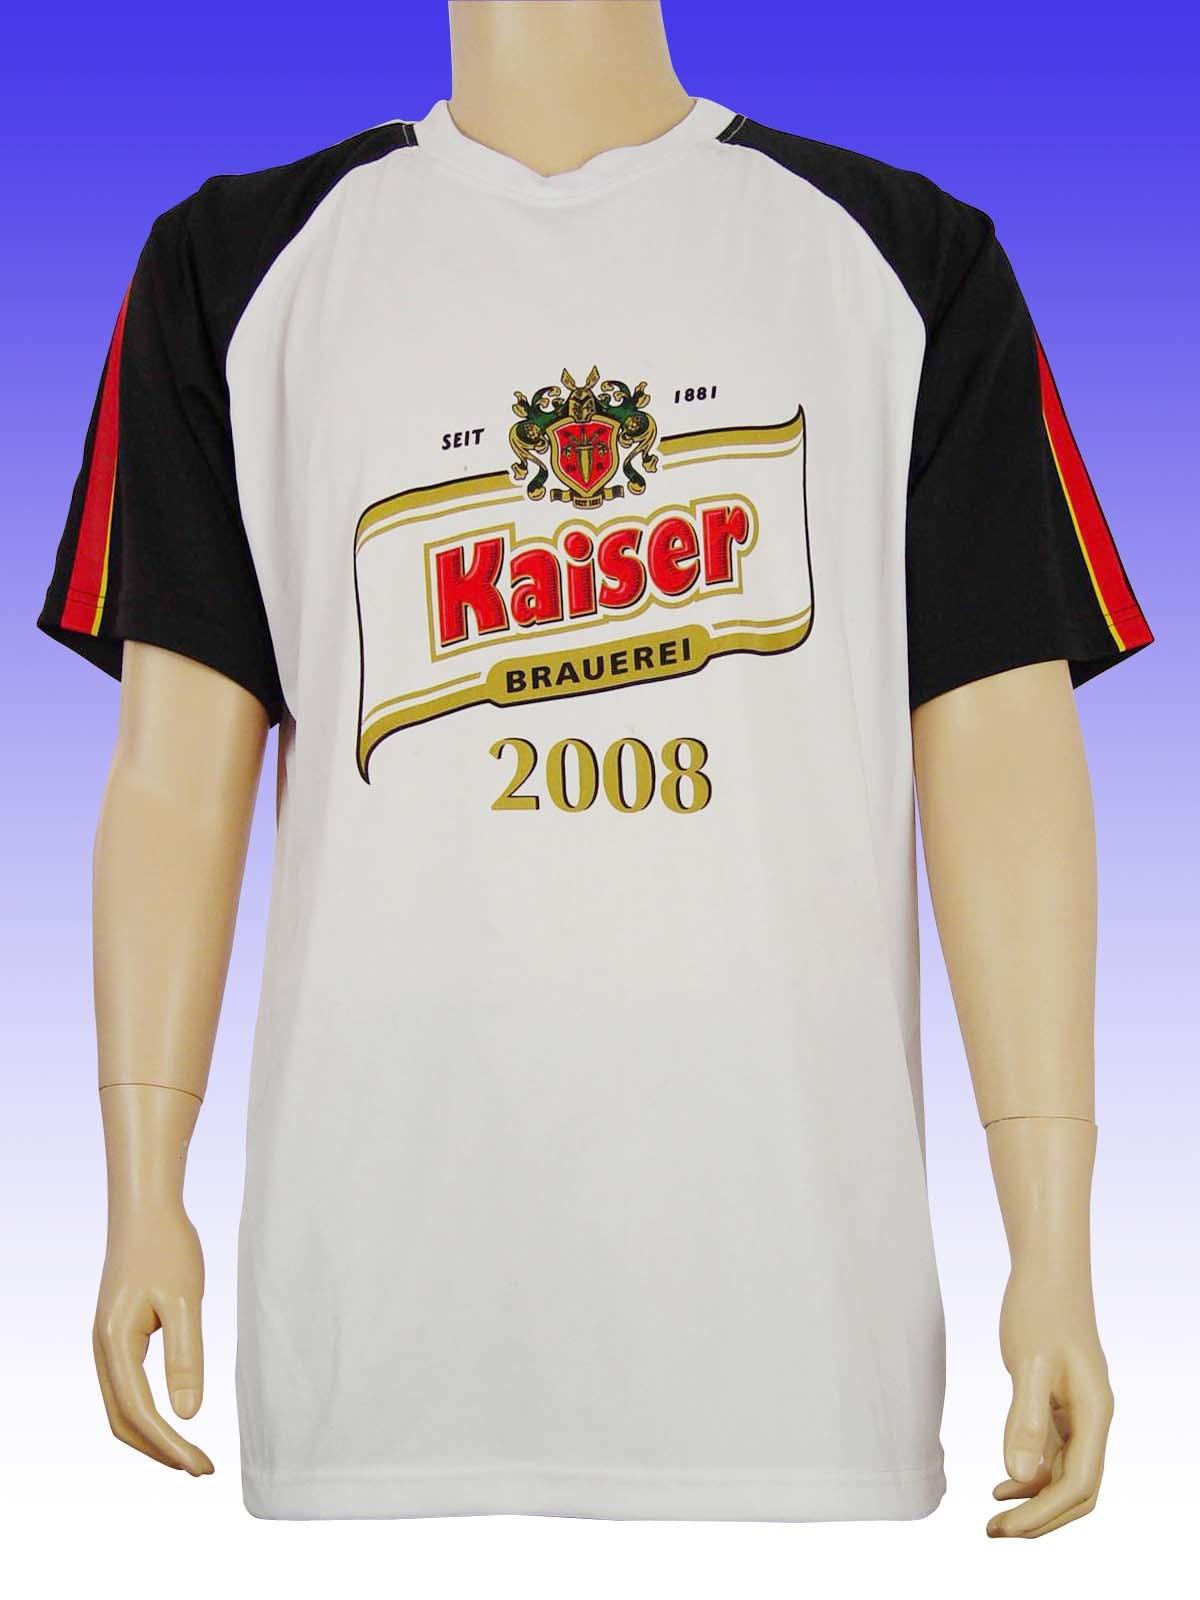 Good Quality T Shirts For Printing Lauren Goss